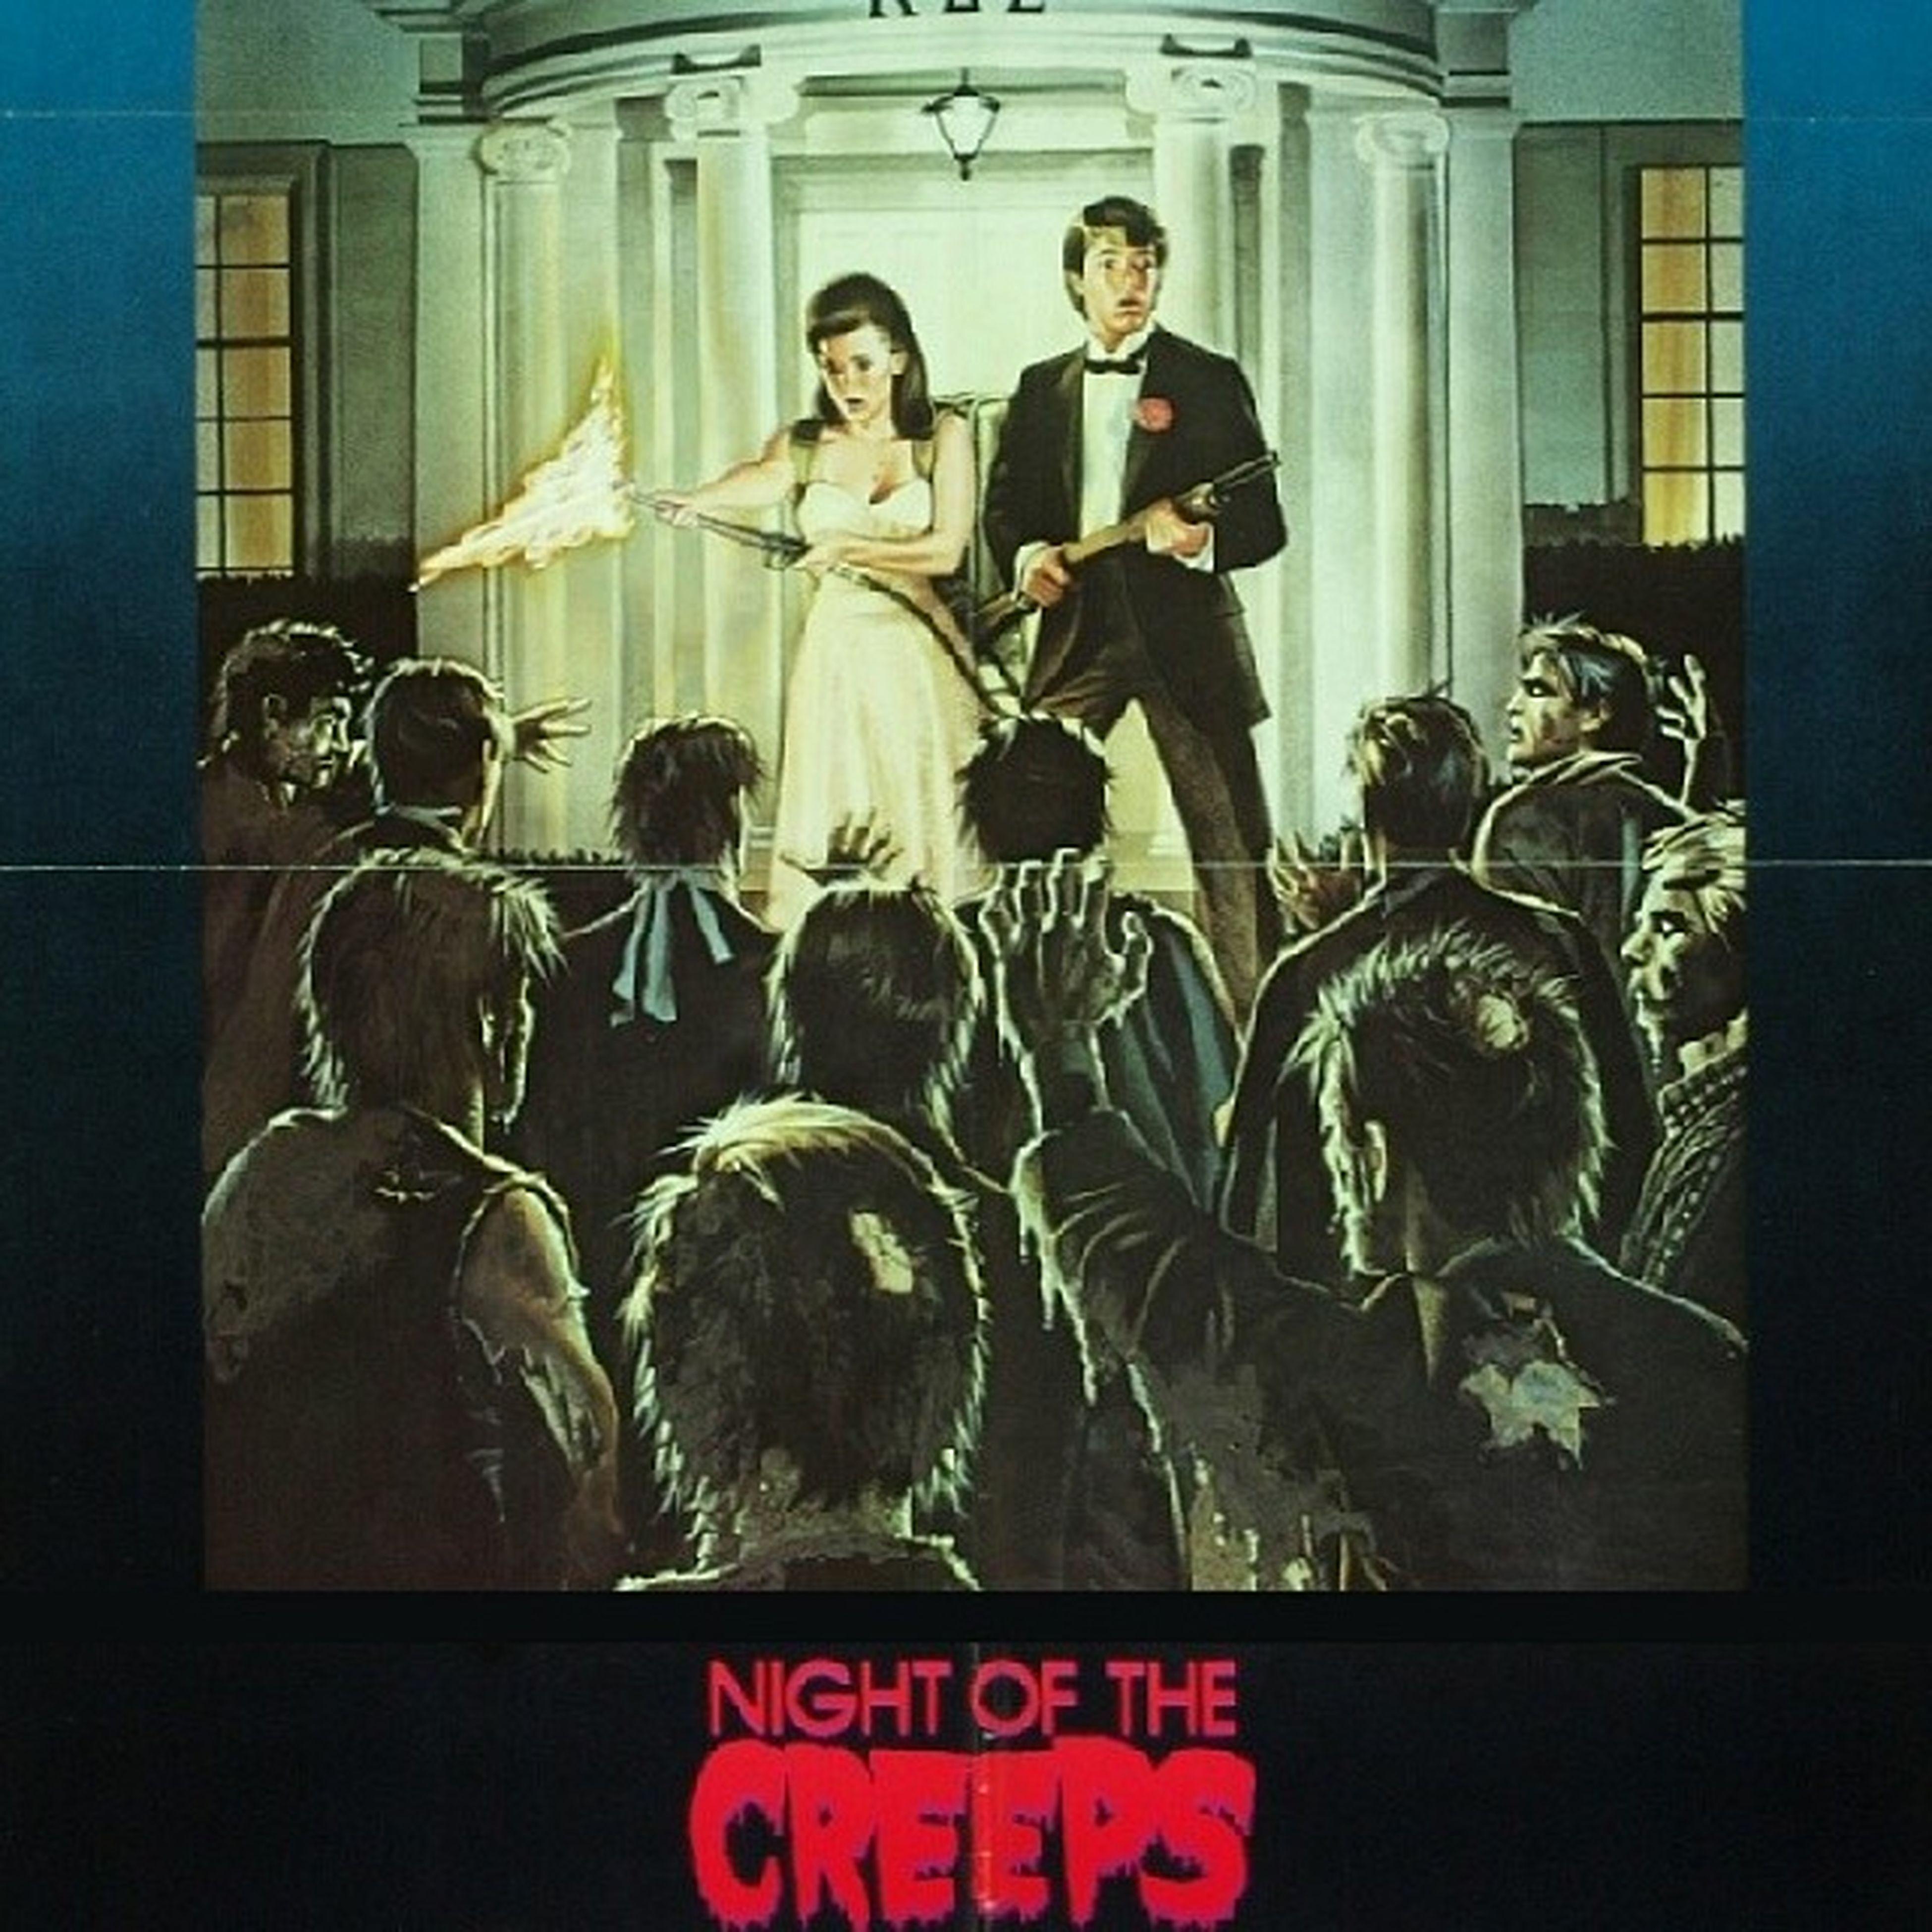 Night of the Creeps is next. Wishihadsomepizza